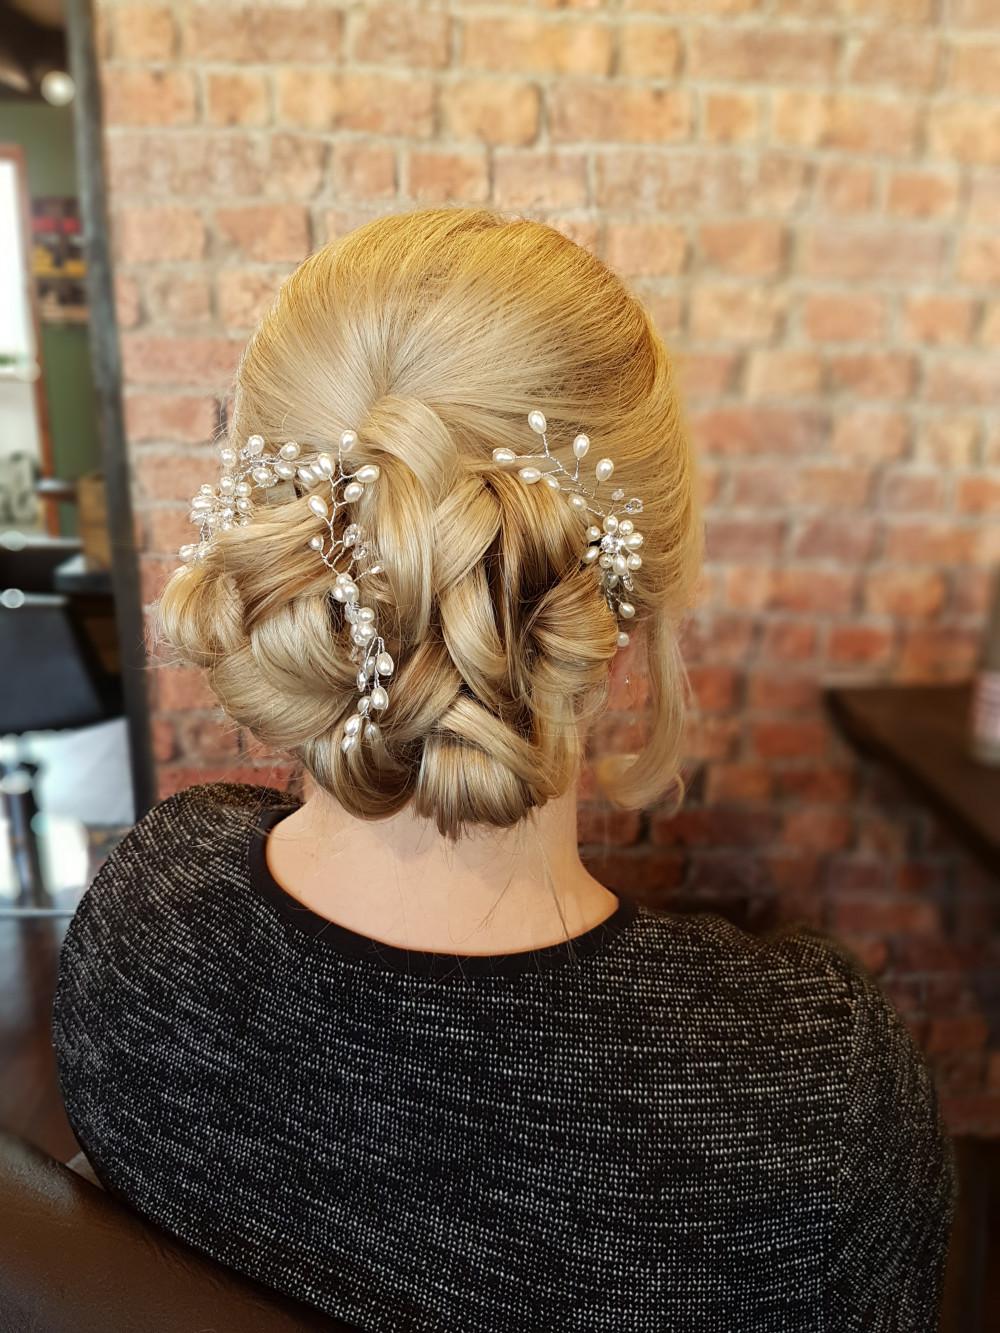 Beautiful bridal up style Hair by Victoria - Make Me Bridal Artist: Swaffields Lilliput hair salon . #curls #bridalhair #updo #soft #weddinghair #bridalhair